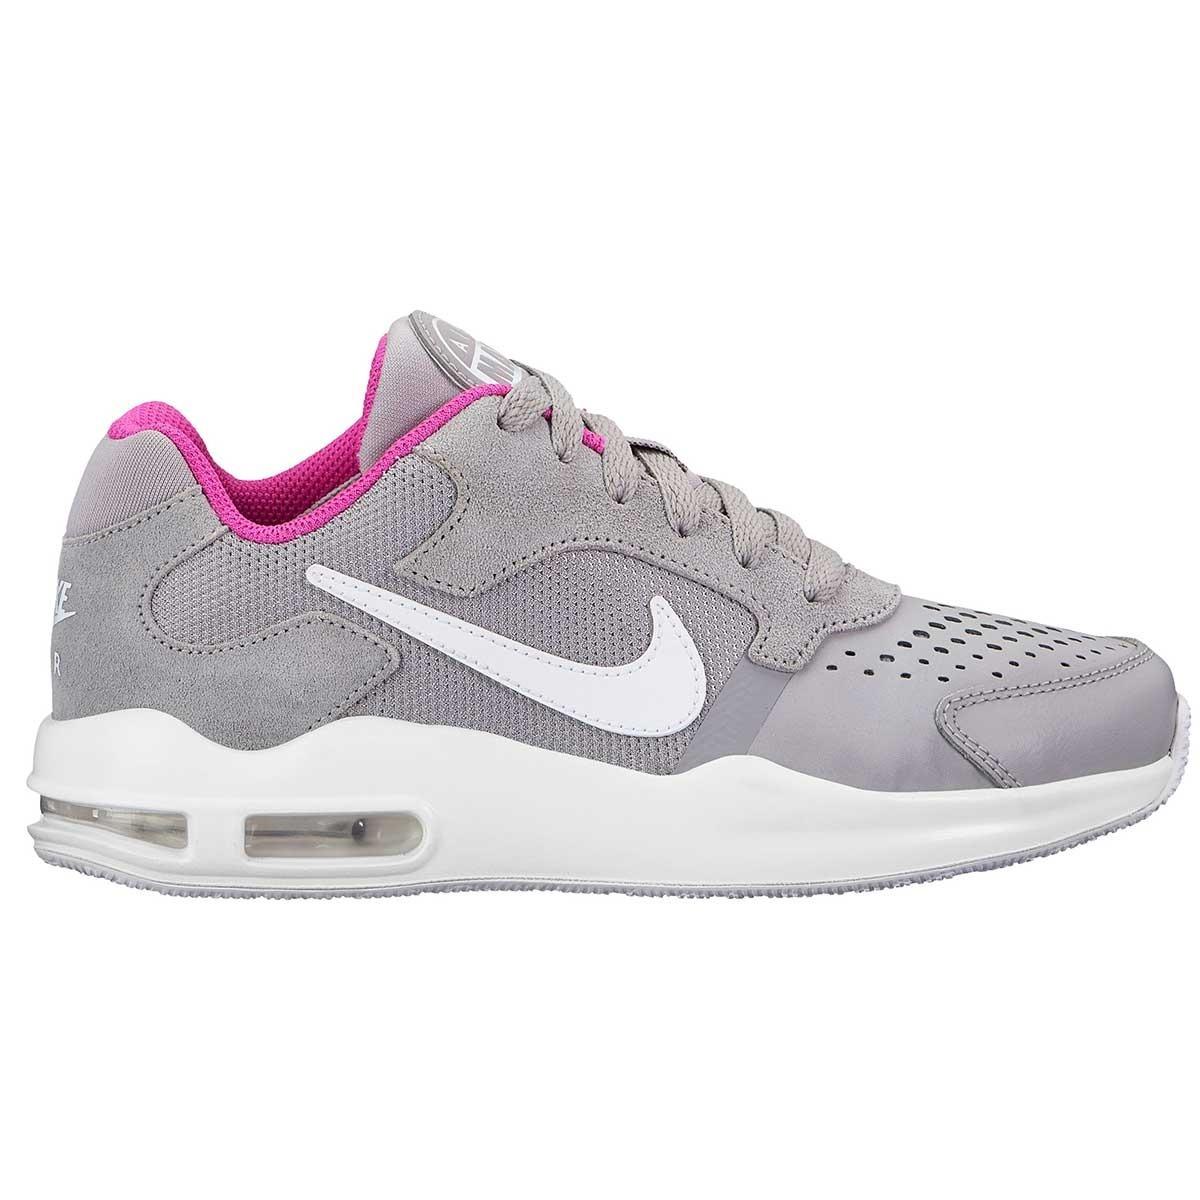 premium selection aff03 4aae5 discount tenis nike air max dama gris rosa 100 original 917642 004.  cargando zoom.